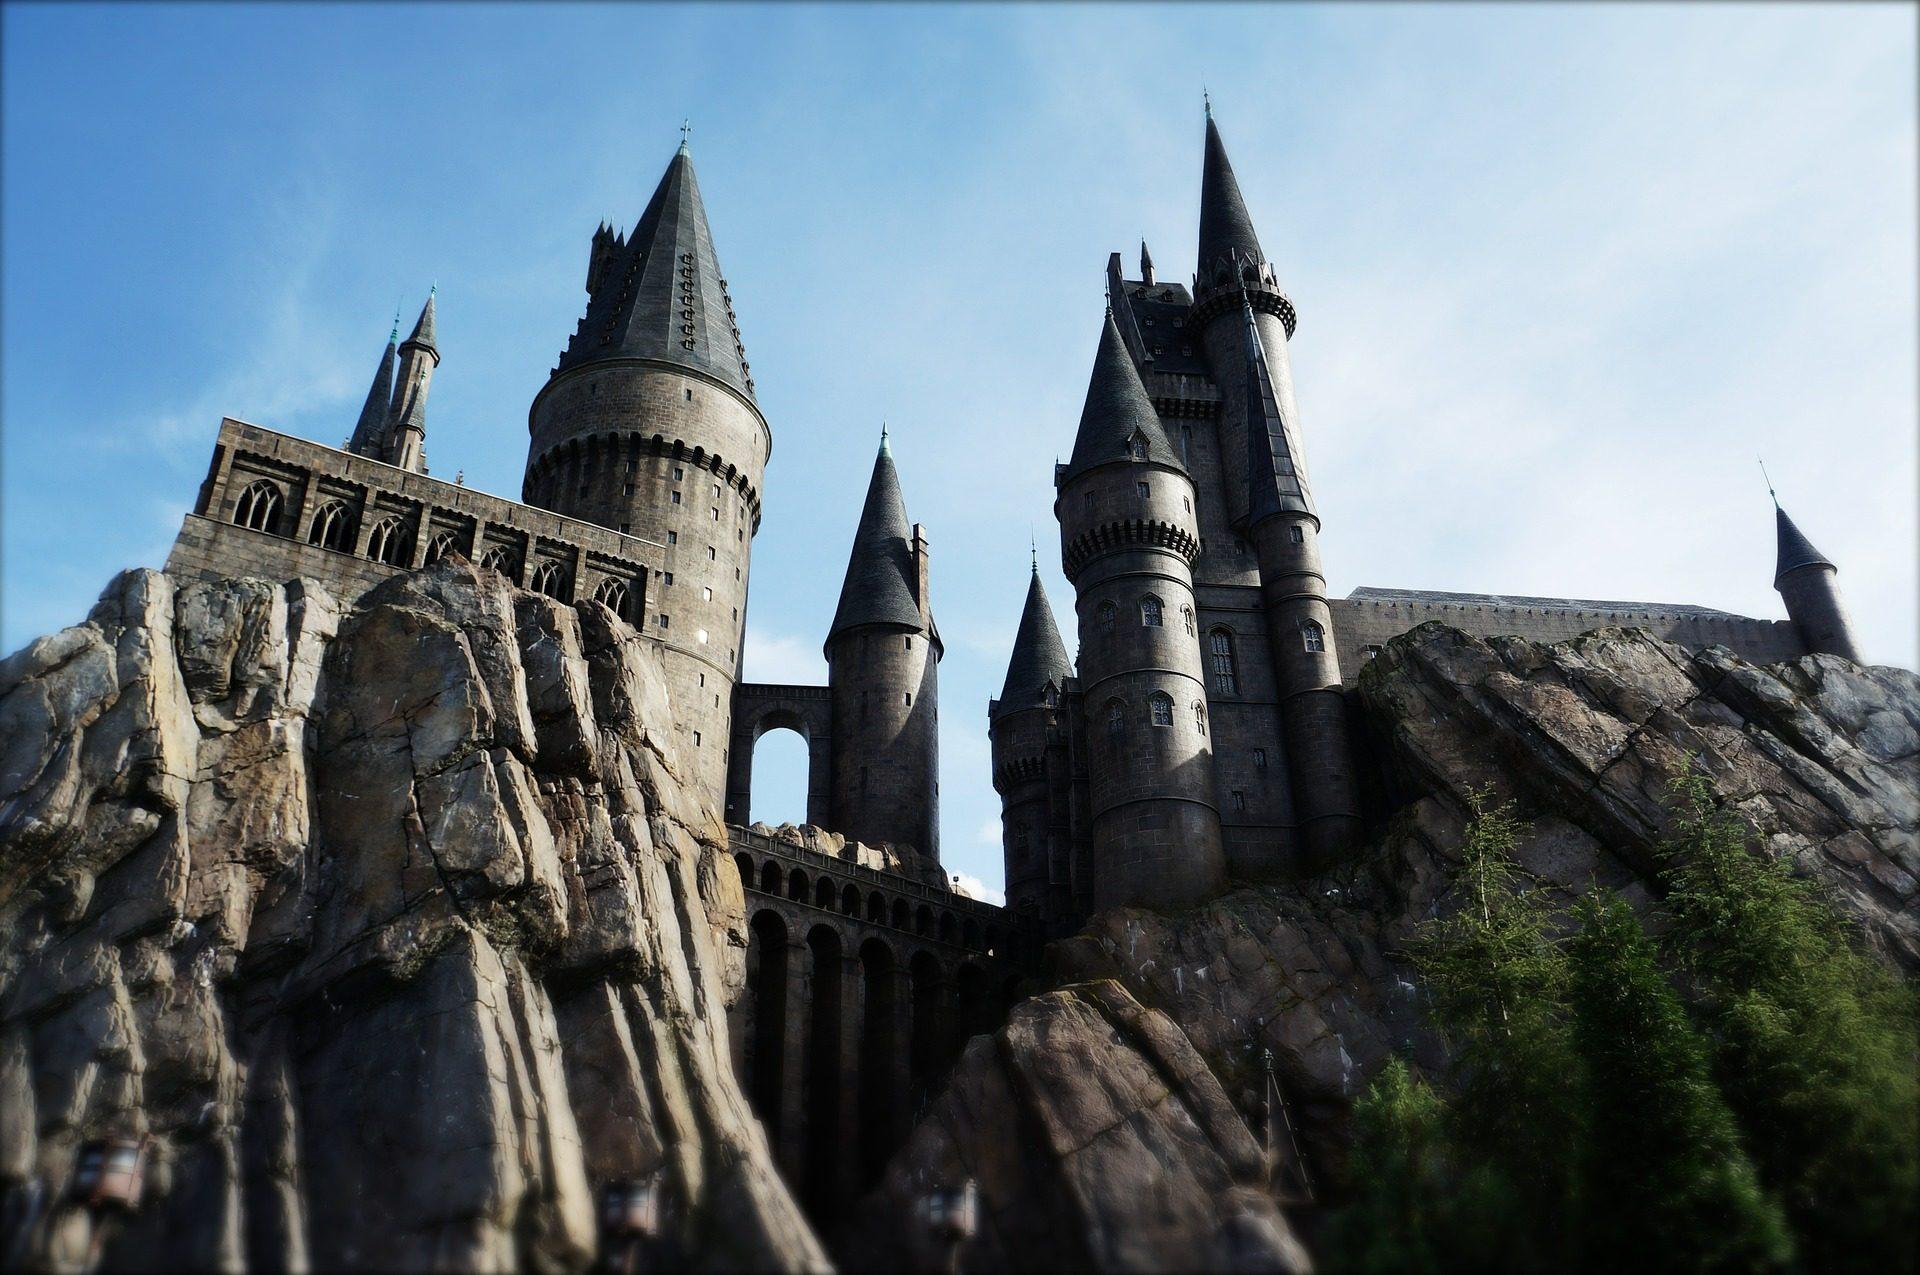 Reise The Making of Harry Potter Tour günstig ab 142,69€ Flug + Hotel + Ticket